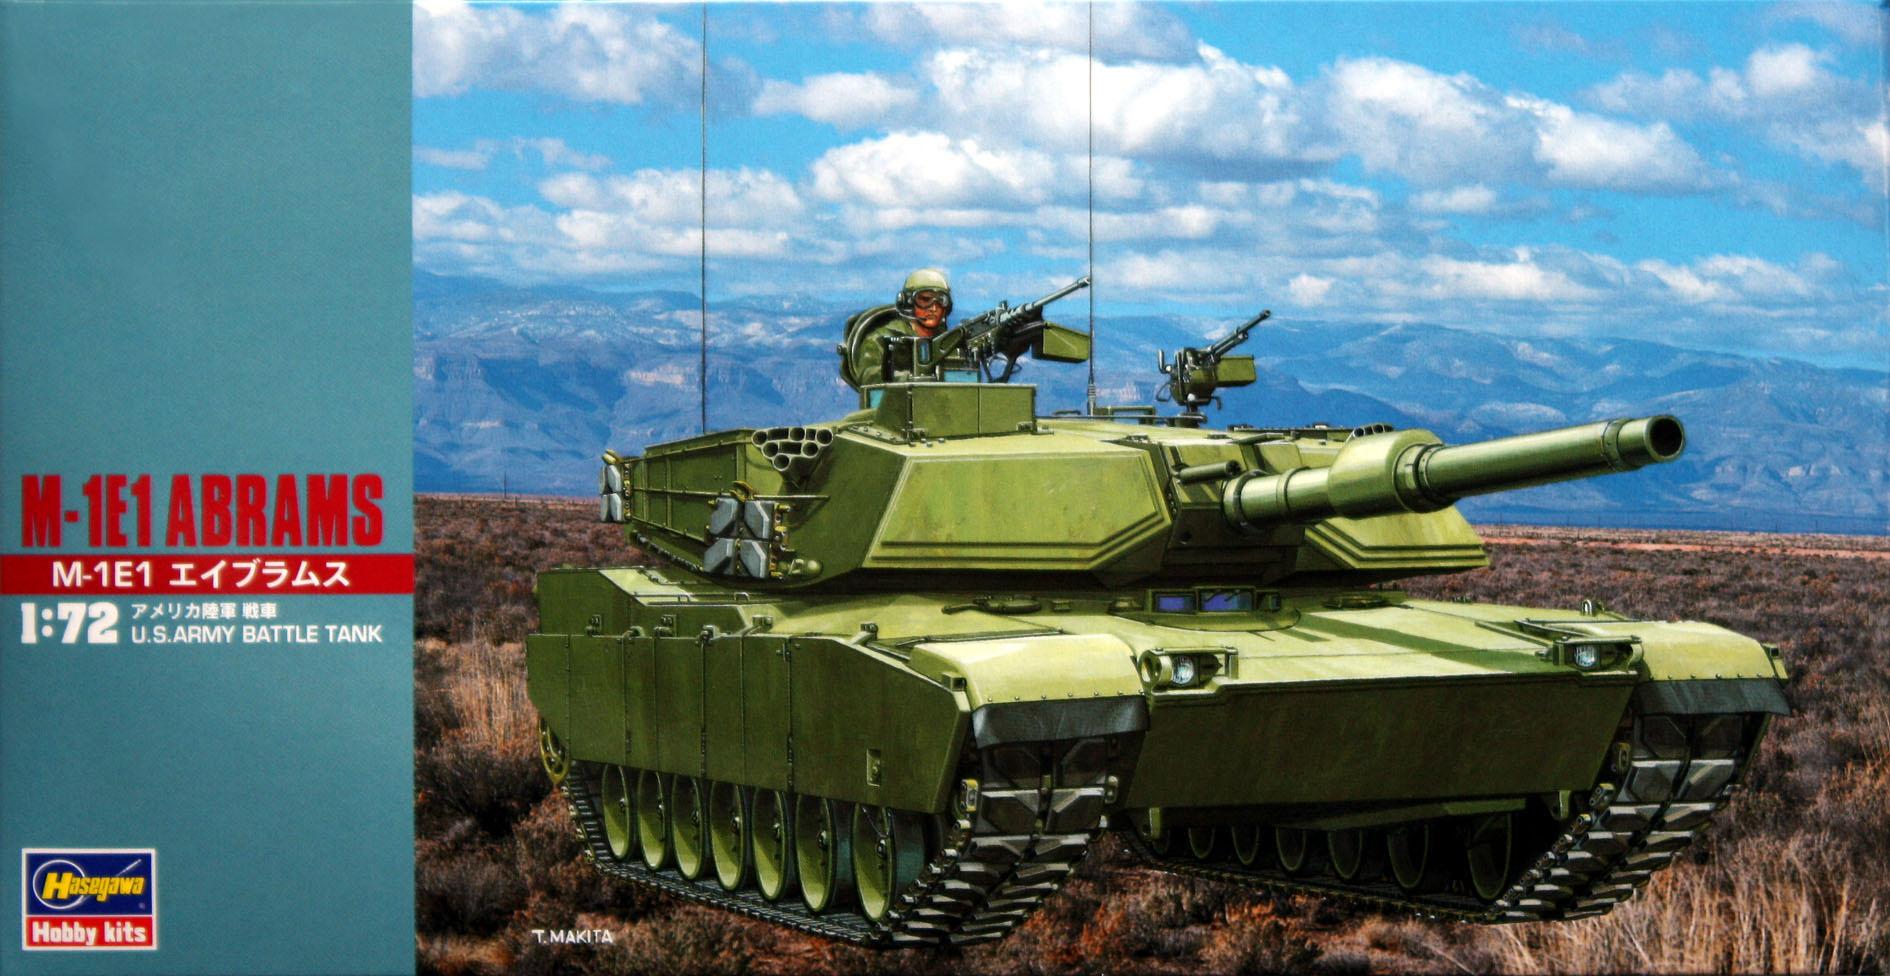 Hasegawa 1/72 M-1E1 Abrams